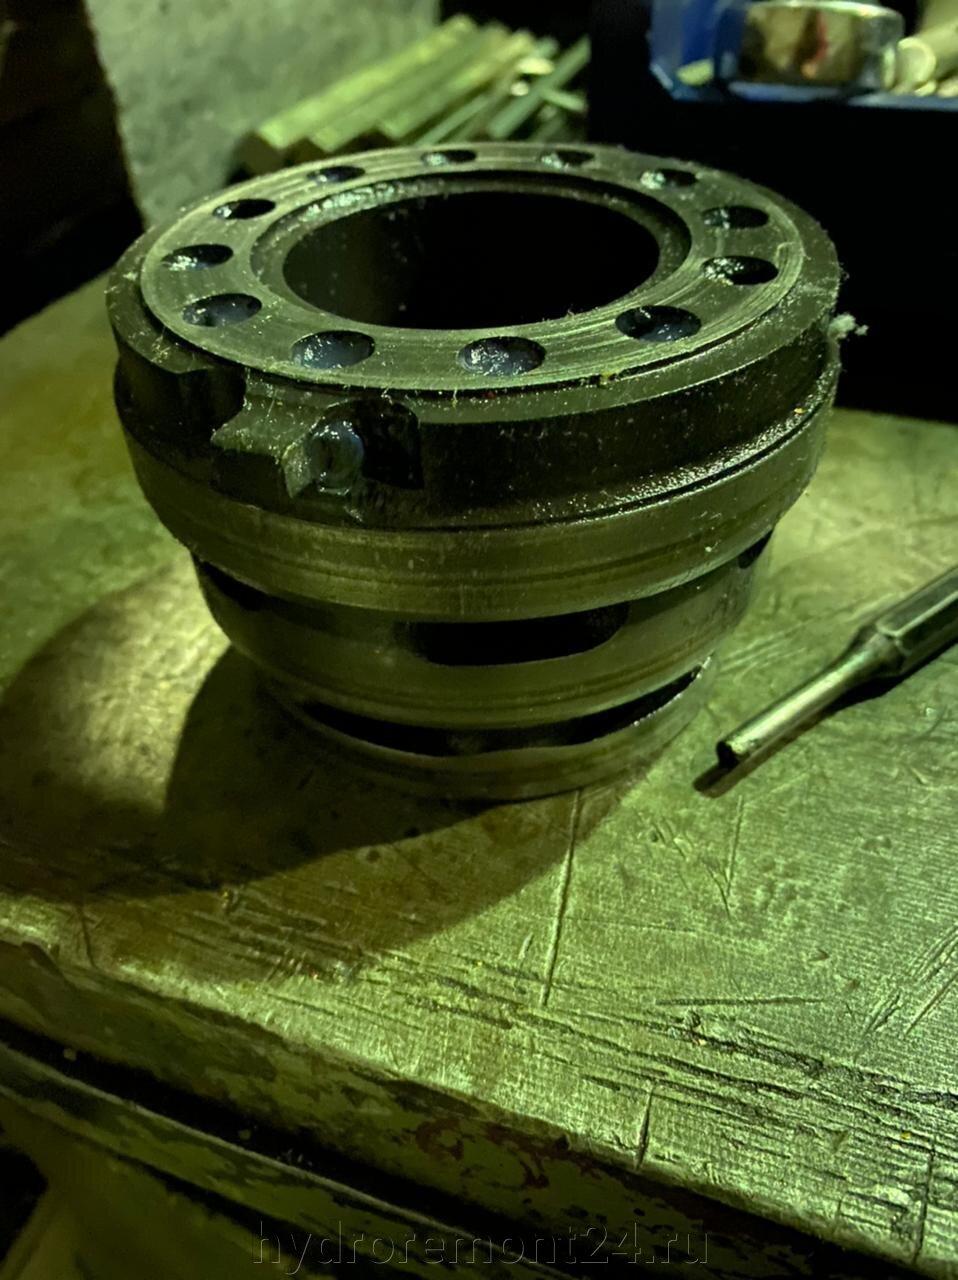 Гидромоторы Poclain - фото pic_03fa49b5ca47d81cb748edfce7203ee9_1920x9000_1.jpg